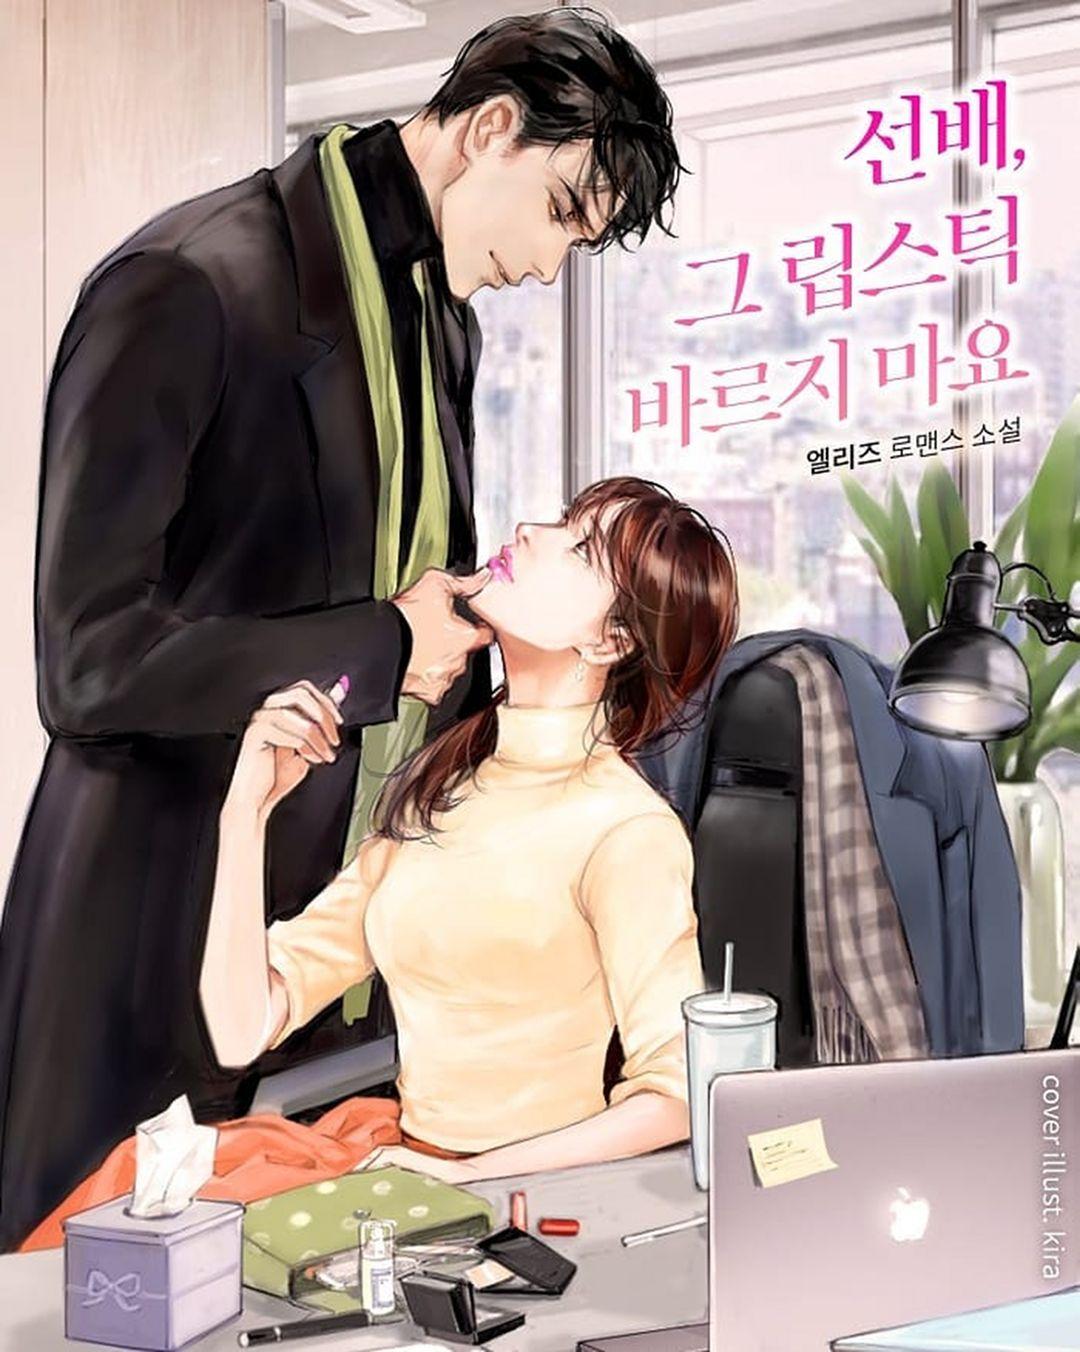 Sunbae Don't Put On That Lipstick